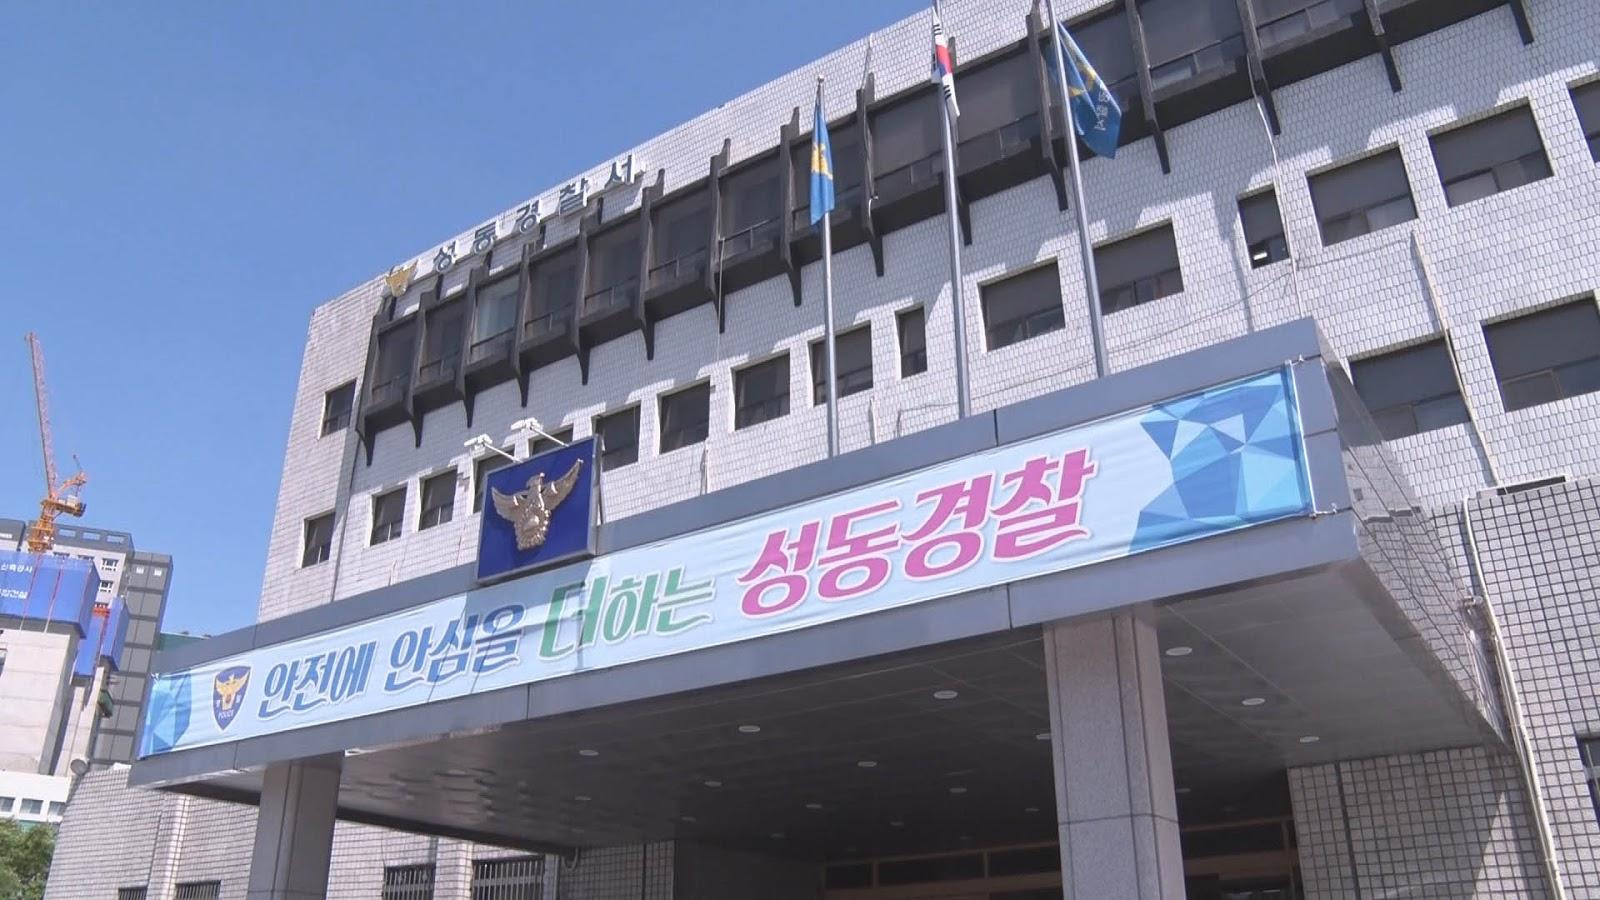 park kyung 2